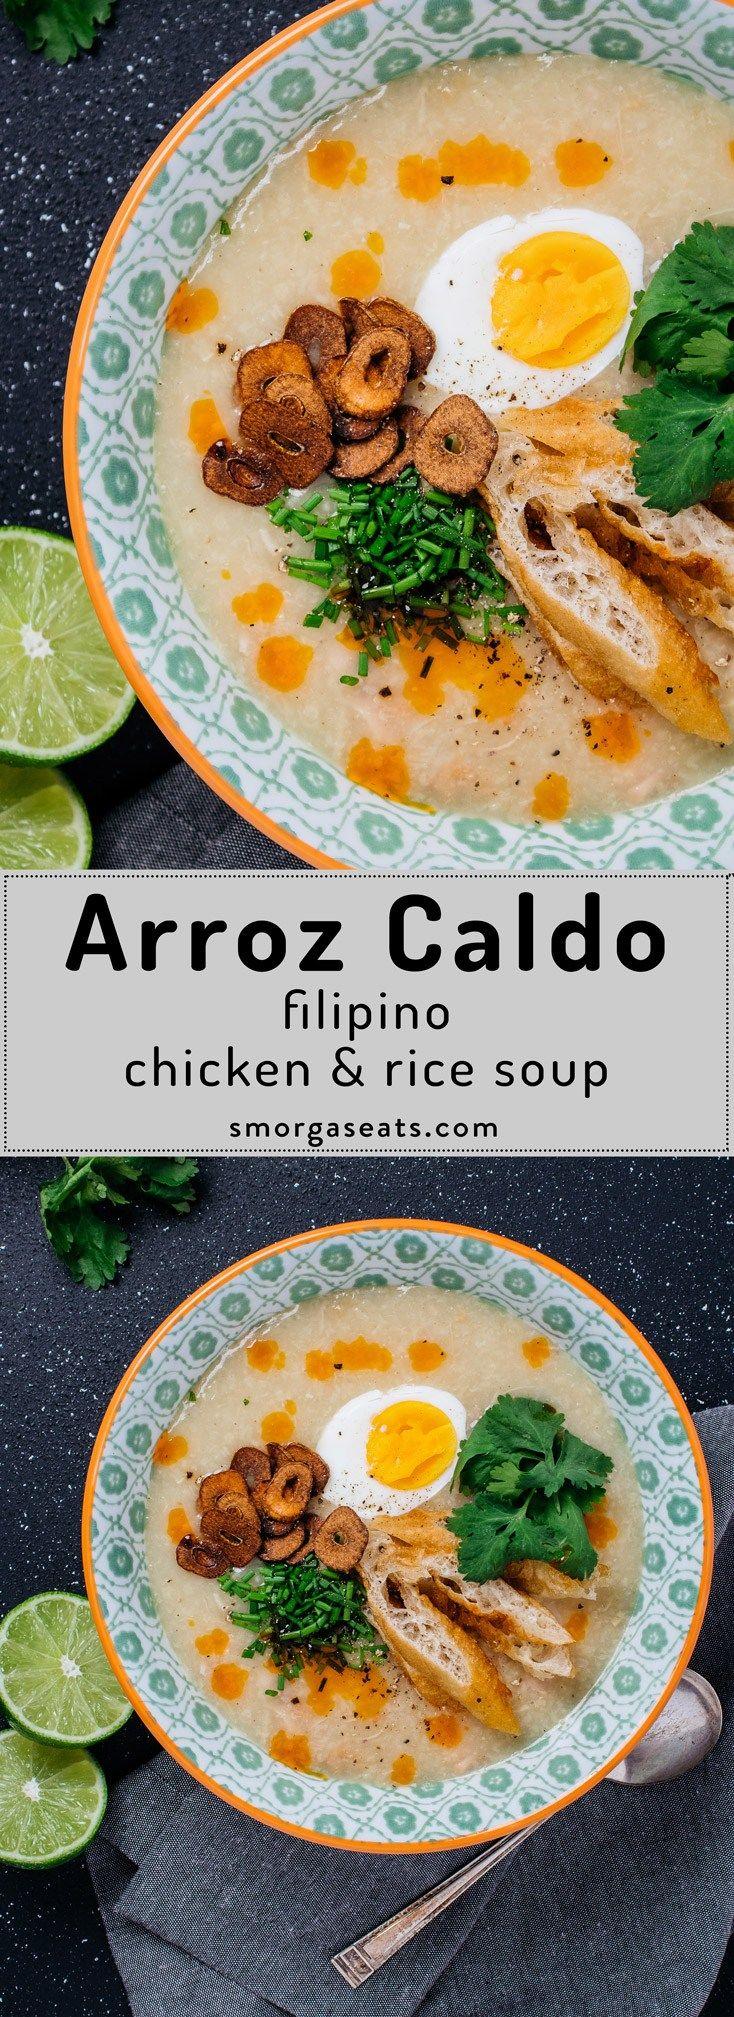 Arroz Caldo (Filipino Chicken & Rice Soup)